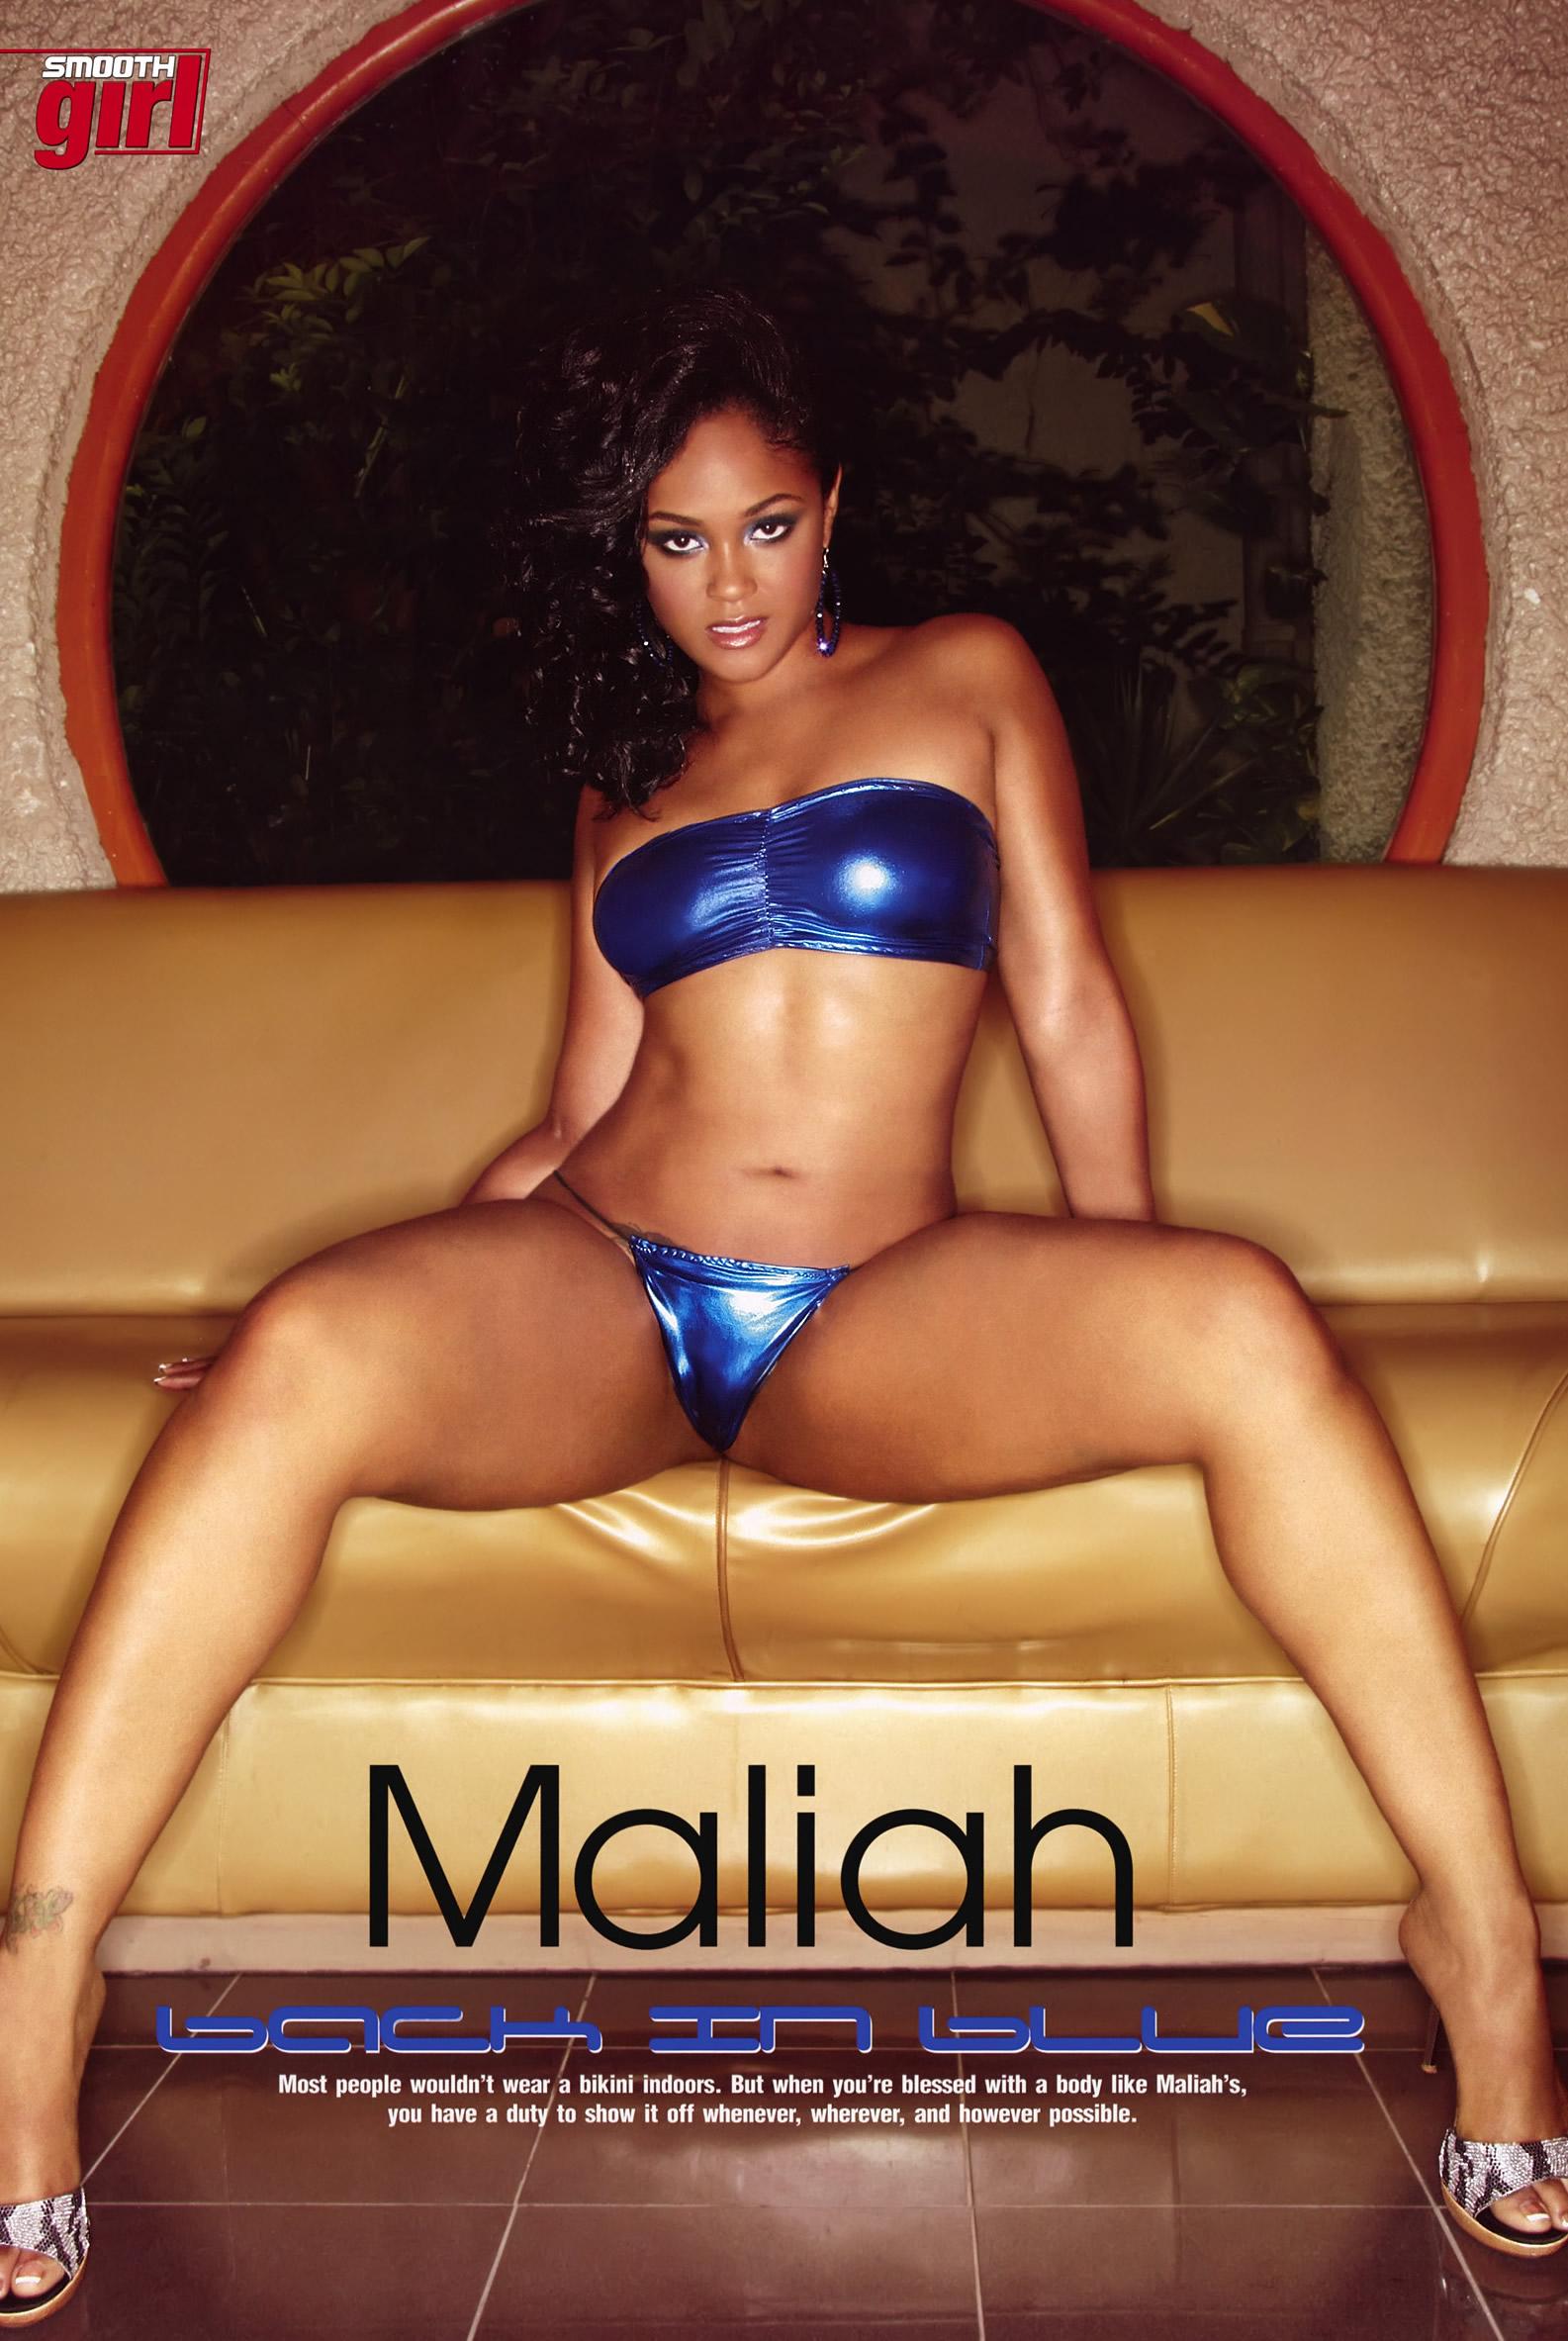 Maliah Michel in a bikini